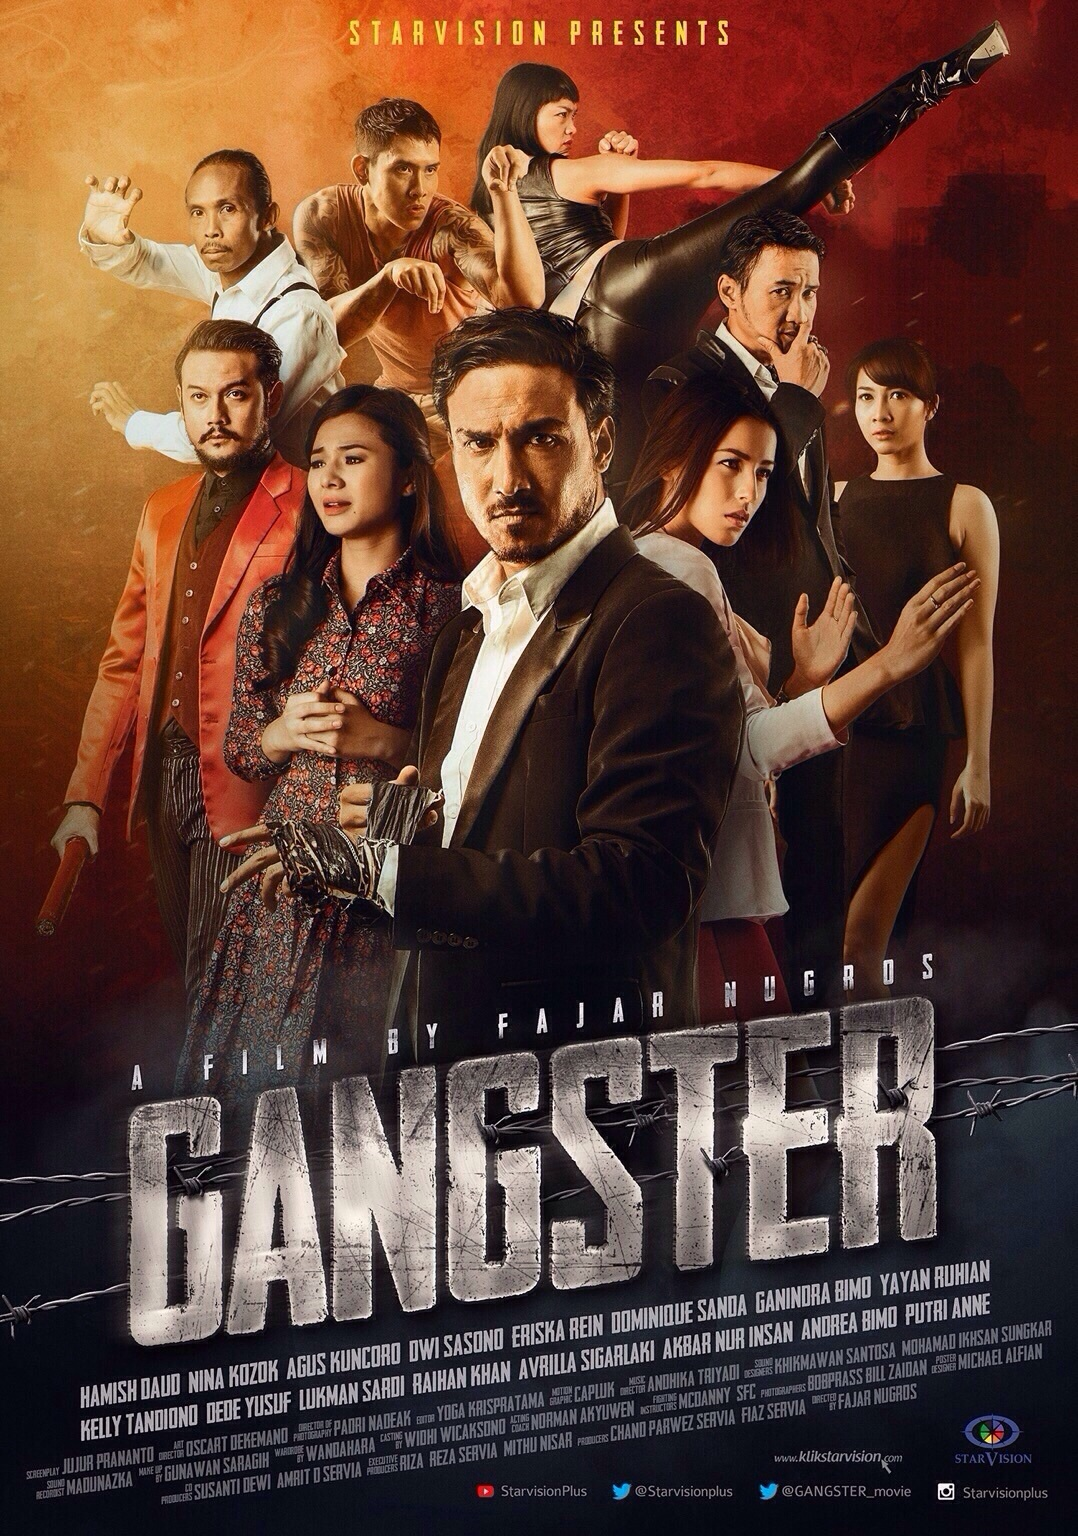 Judul Film Gangster : judul, gangster, Gangster, (film), Wikipedia, Bahasa, Indonesia,, Ensiklopedia, Bebas